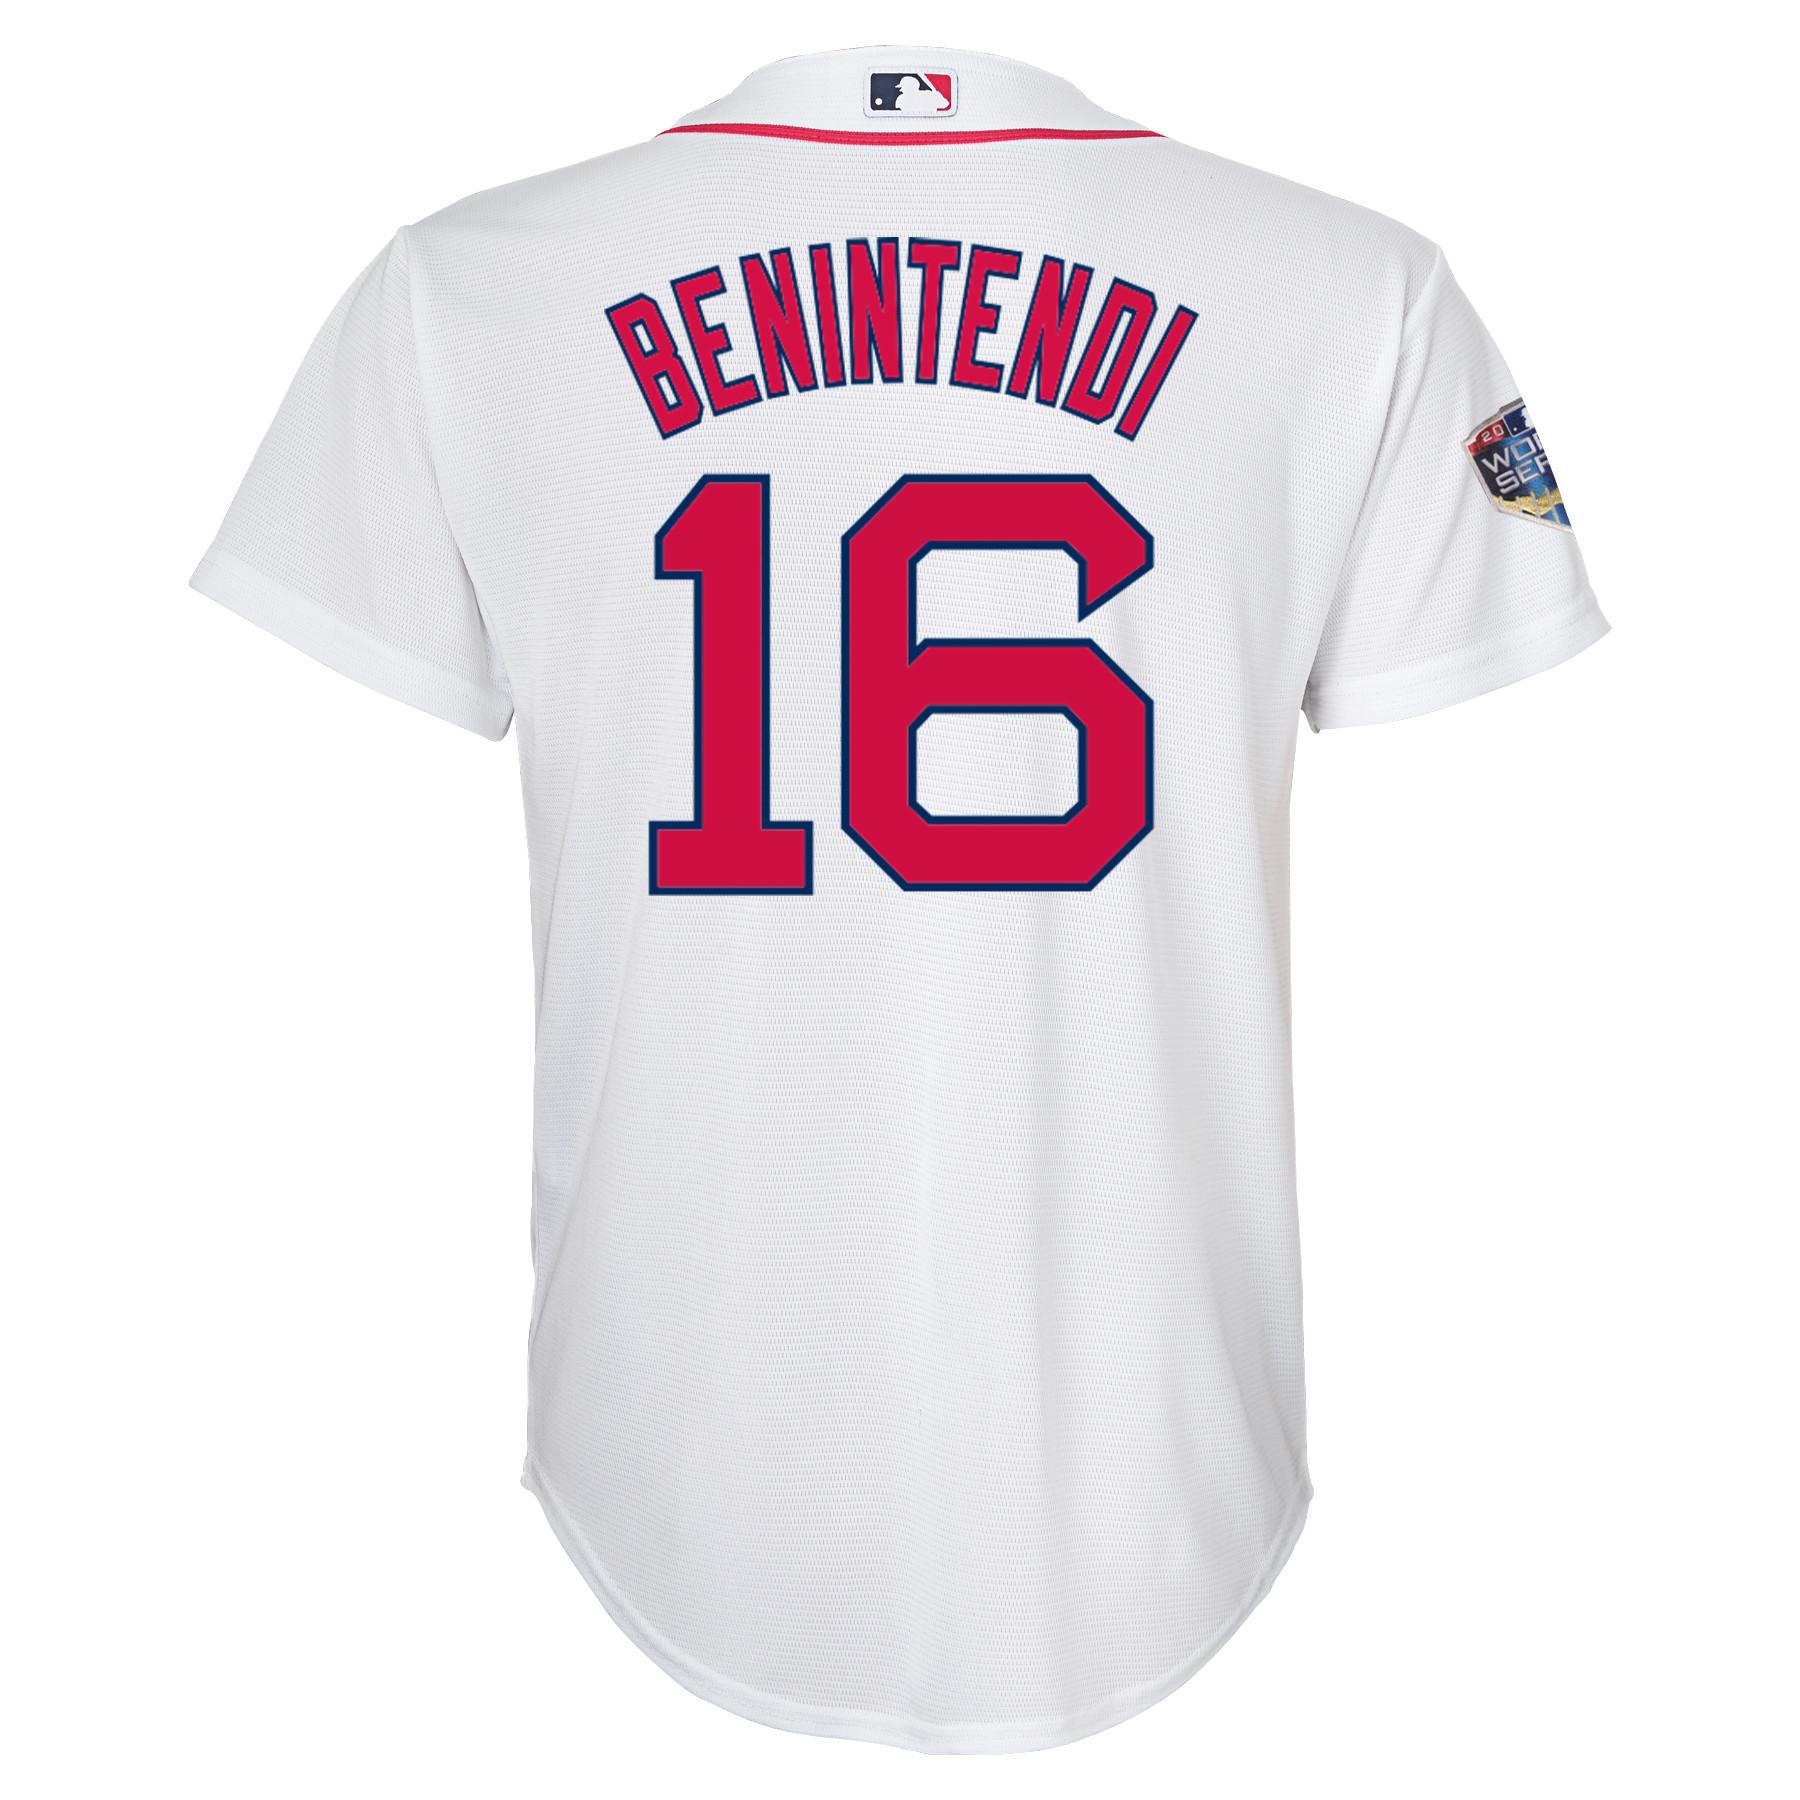 61b503a56 Andrew Benintendi Boston Red Sox Majestic Youth 2018 World Series ...